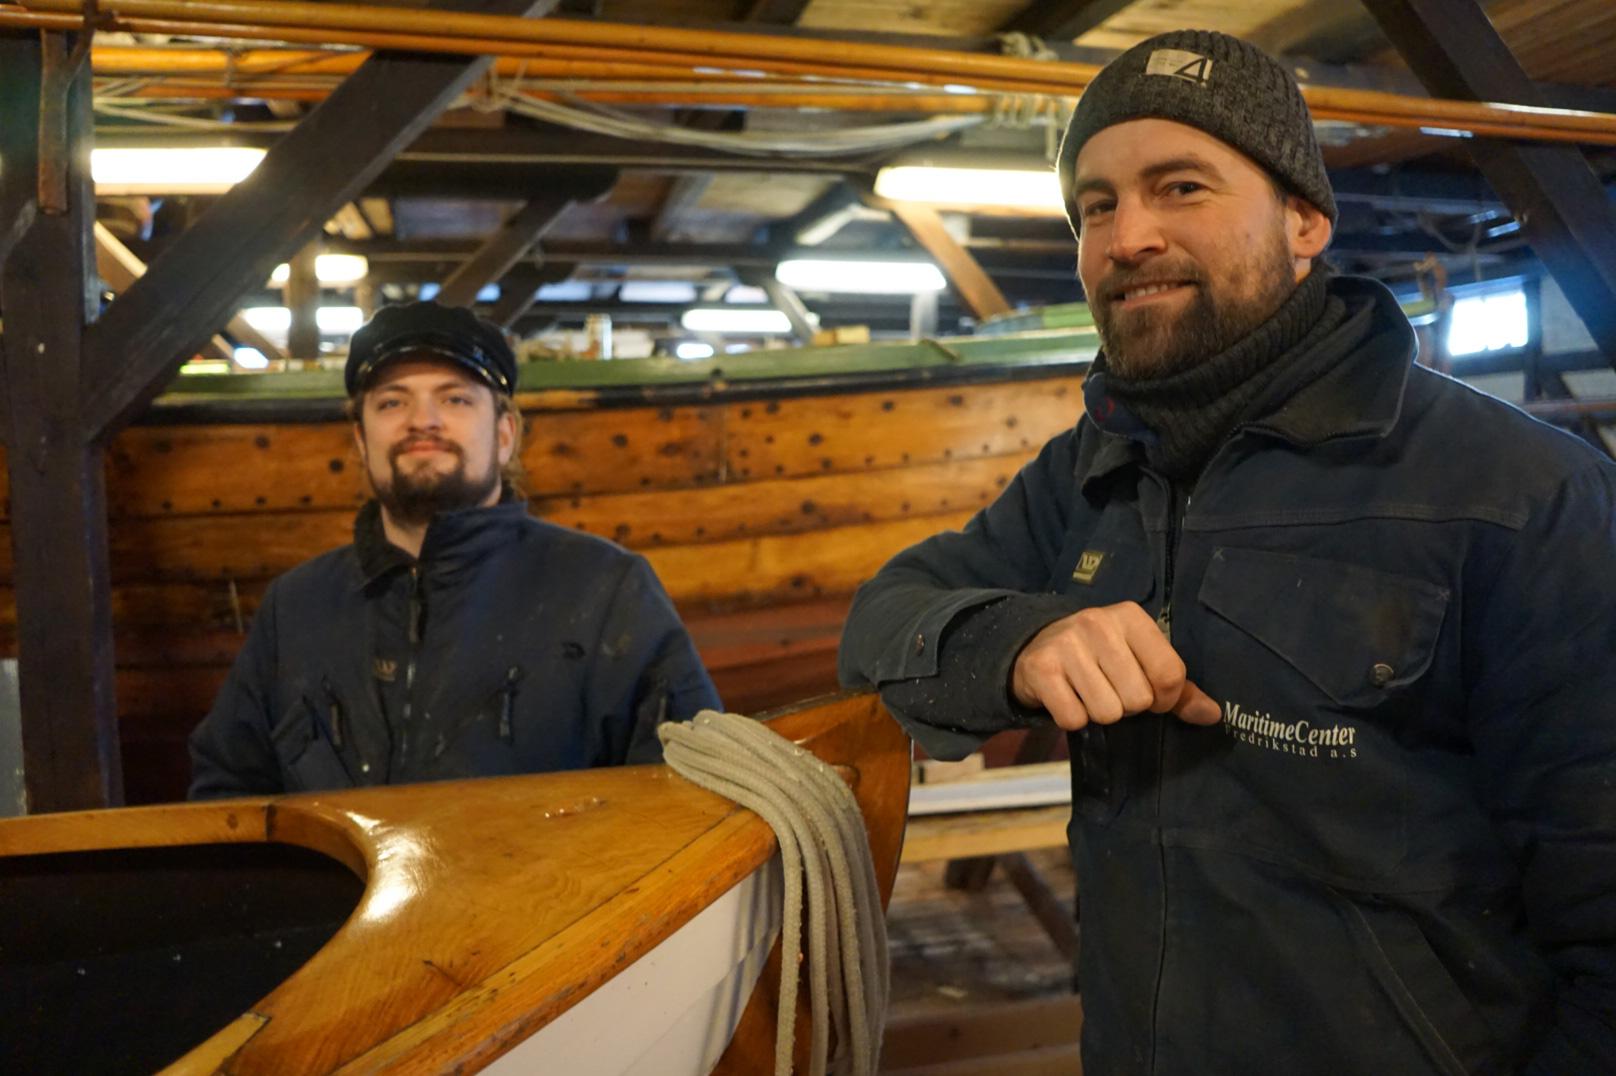 Fagansvarlig Caspar Hillestad er fornøyd med lærling Gudmundurs vel gjennomførte fagprøve i trebåtbyggerfaget